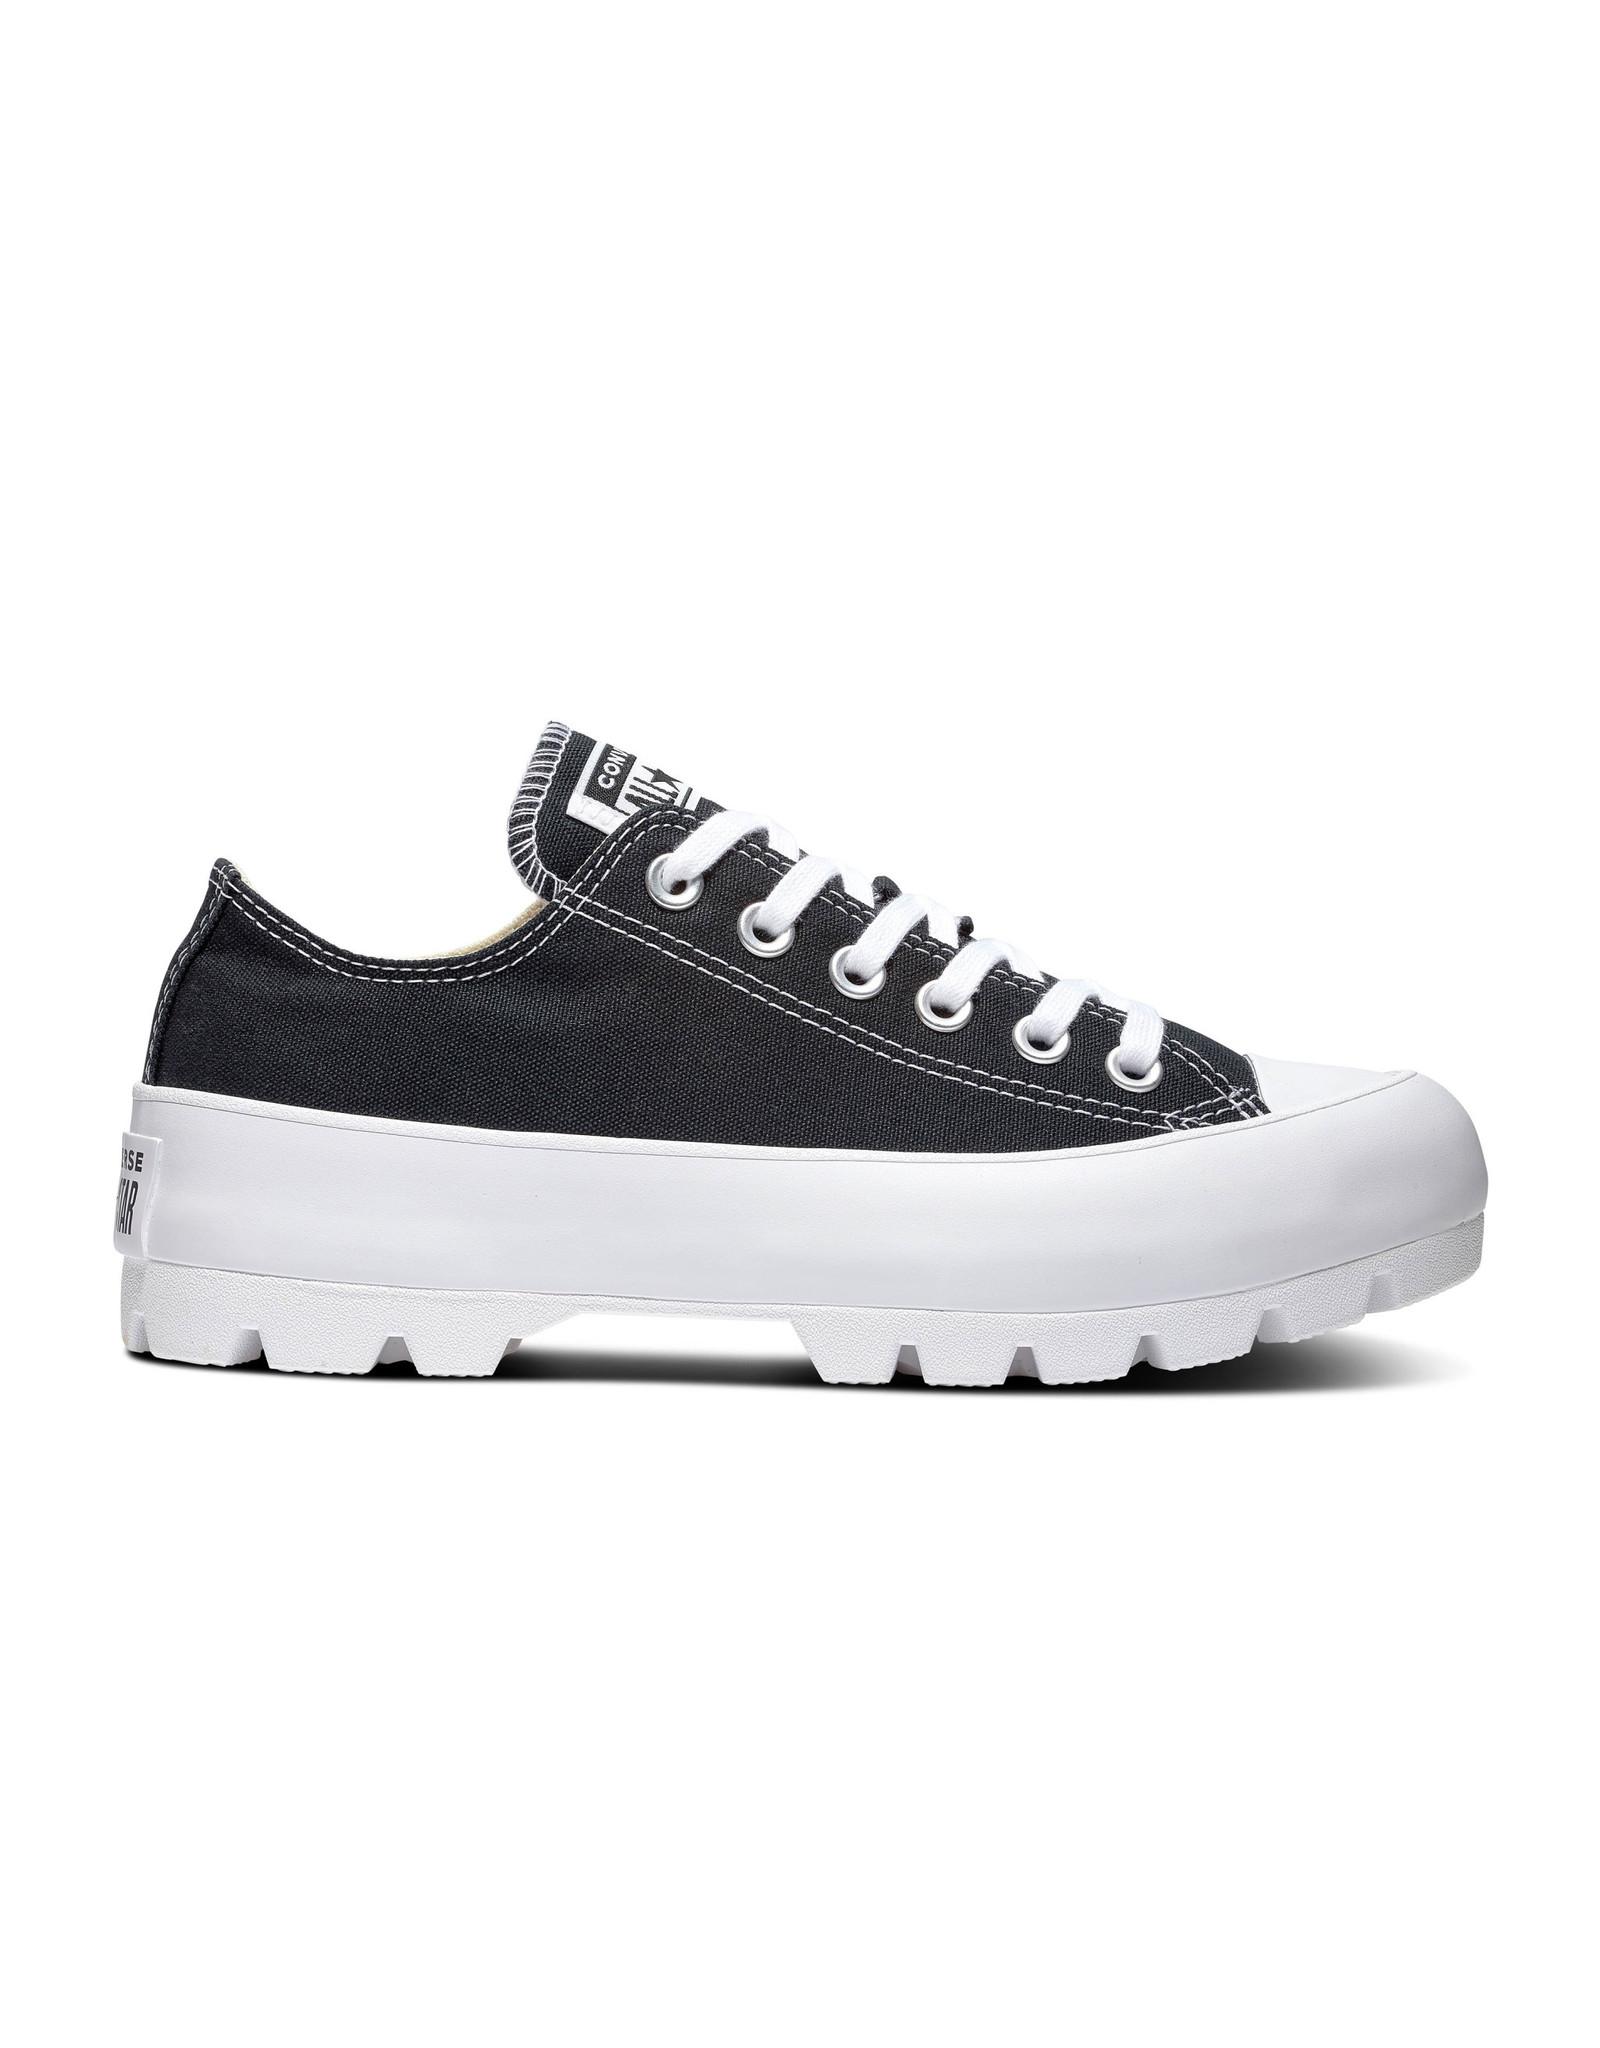 CONVERSE CHUCK TAYLOR LUGGED OX BLACK/WHITE/WHITE C094BX-567681C